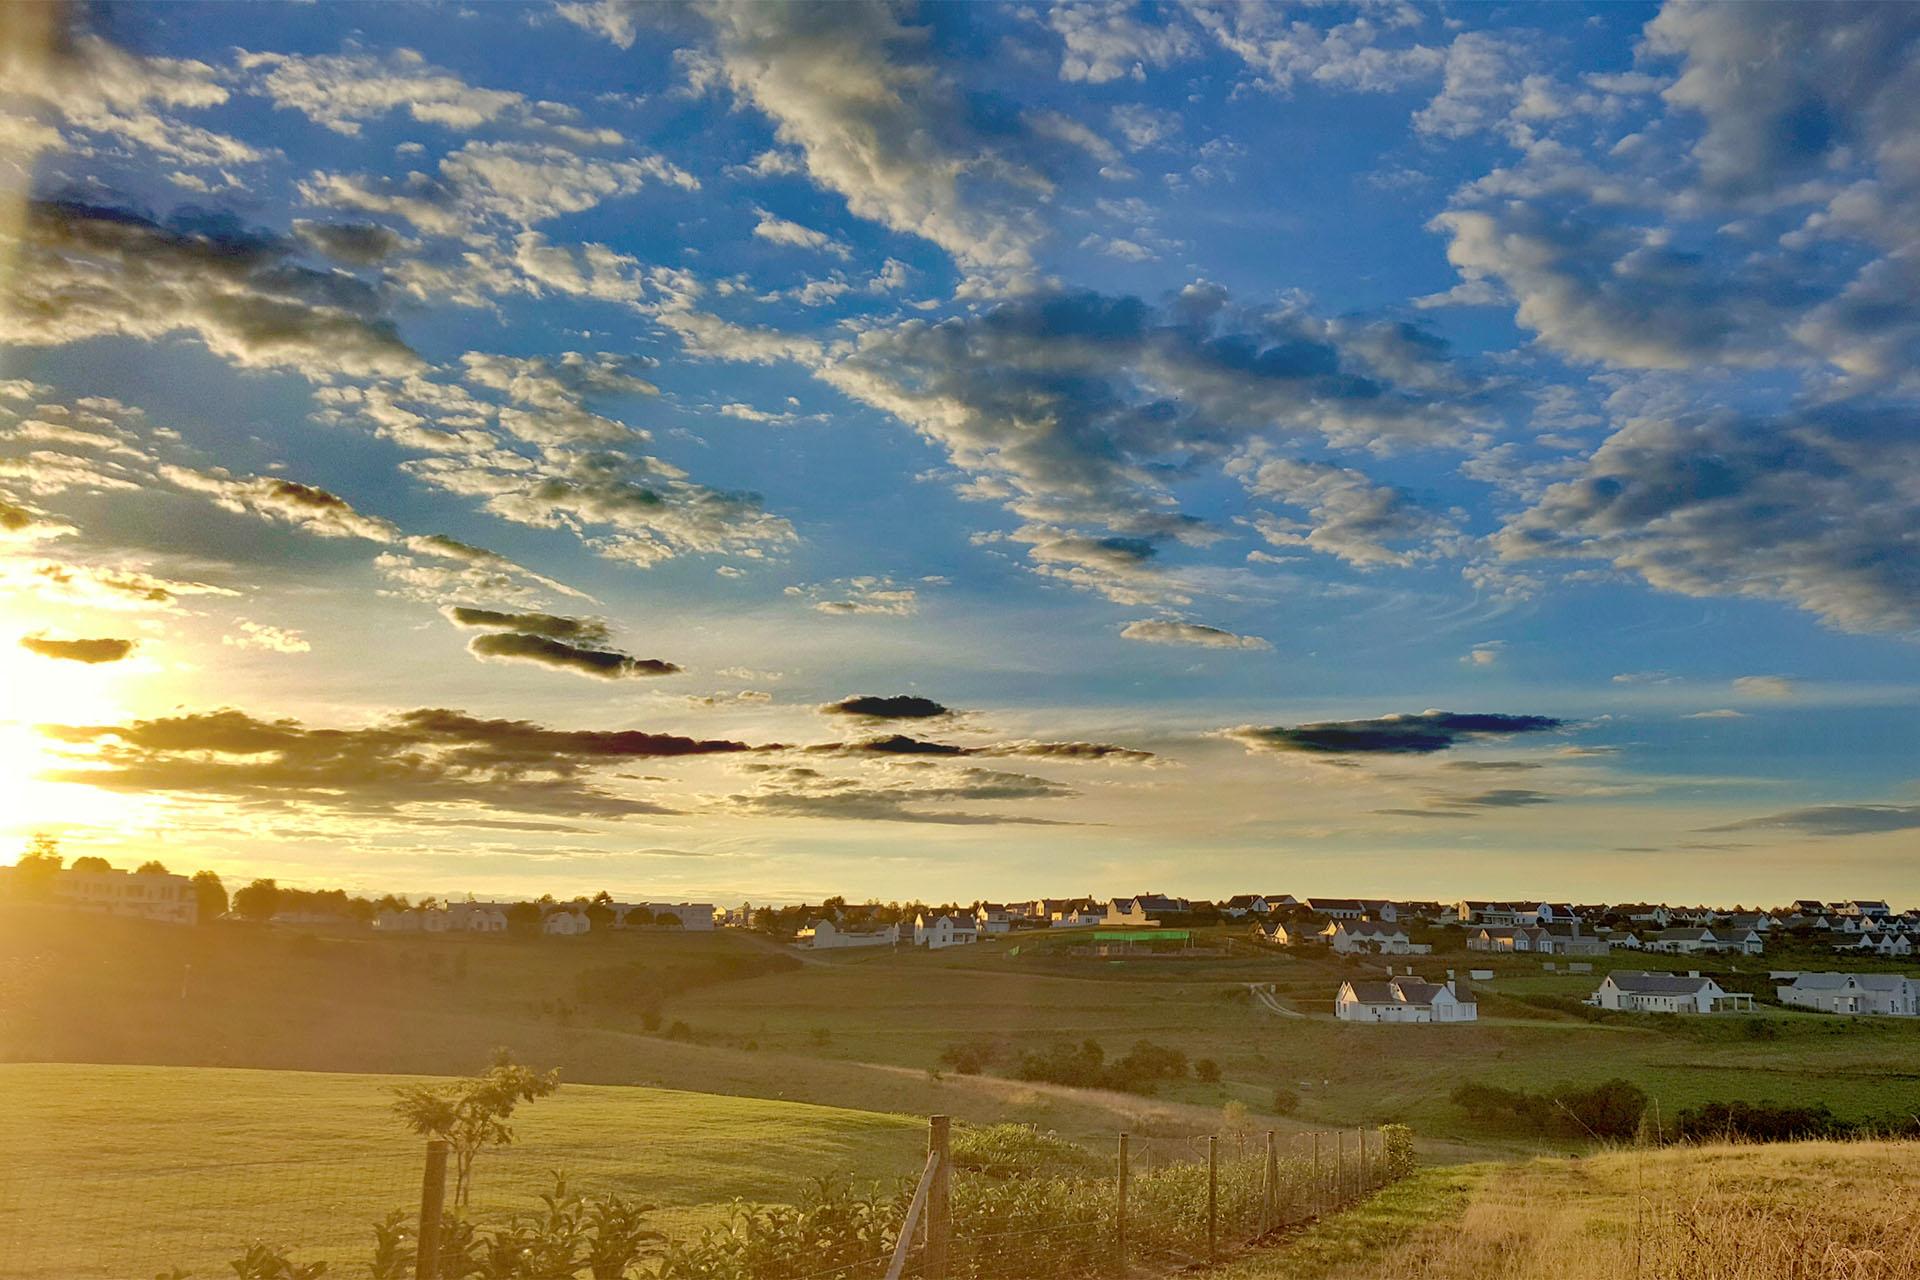 garlington-bird-list-amenities-rockjumper-birding-garlington-estate-luxury-country-development-hilton-kzn-midlands